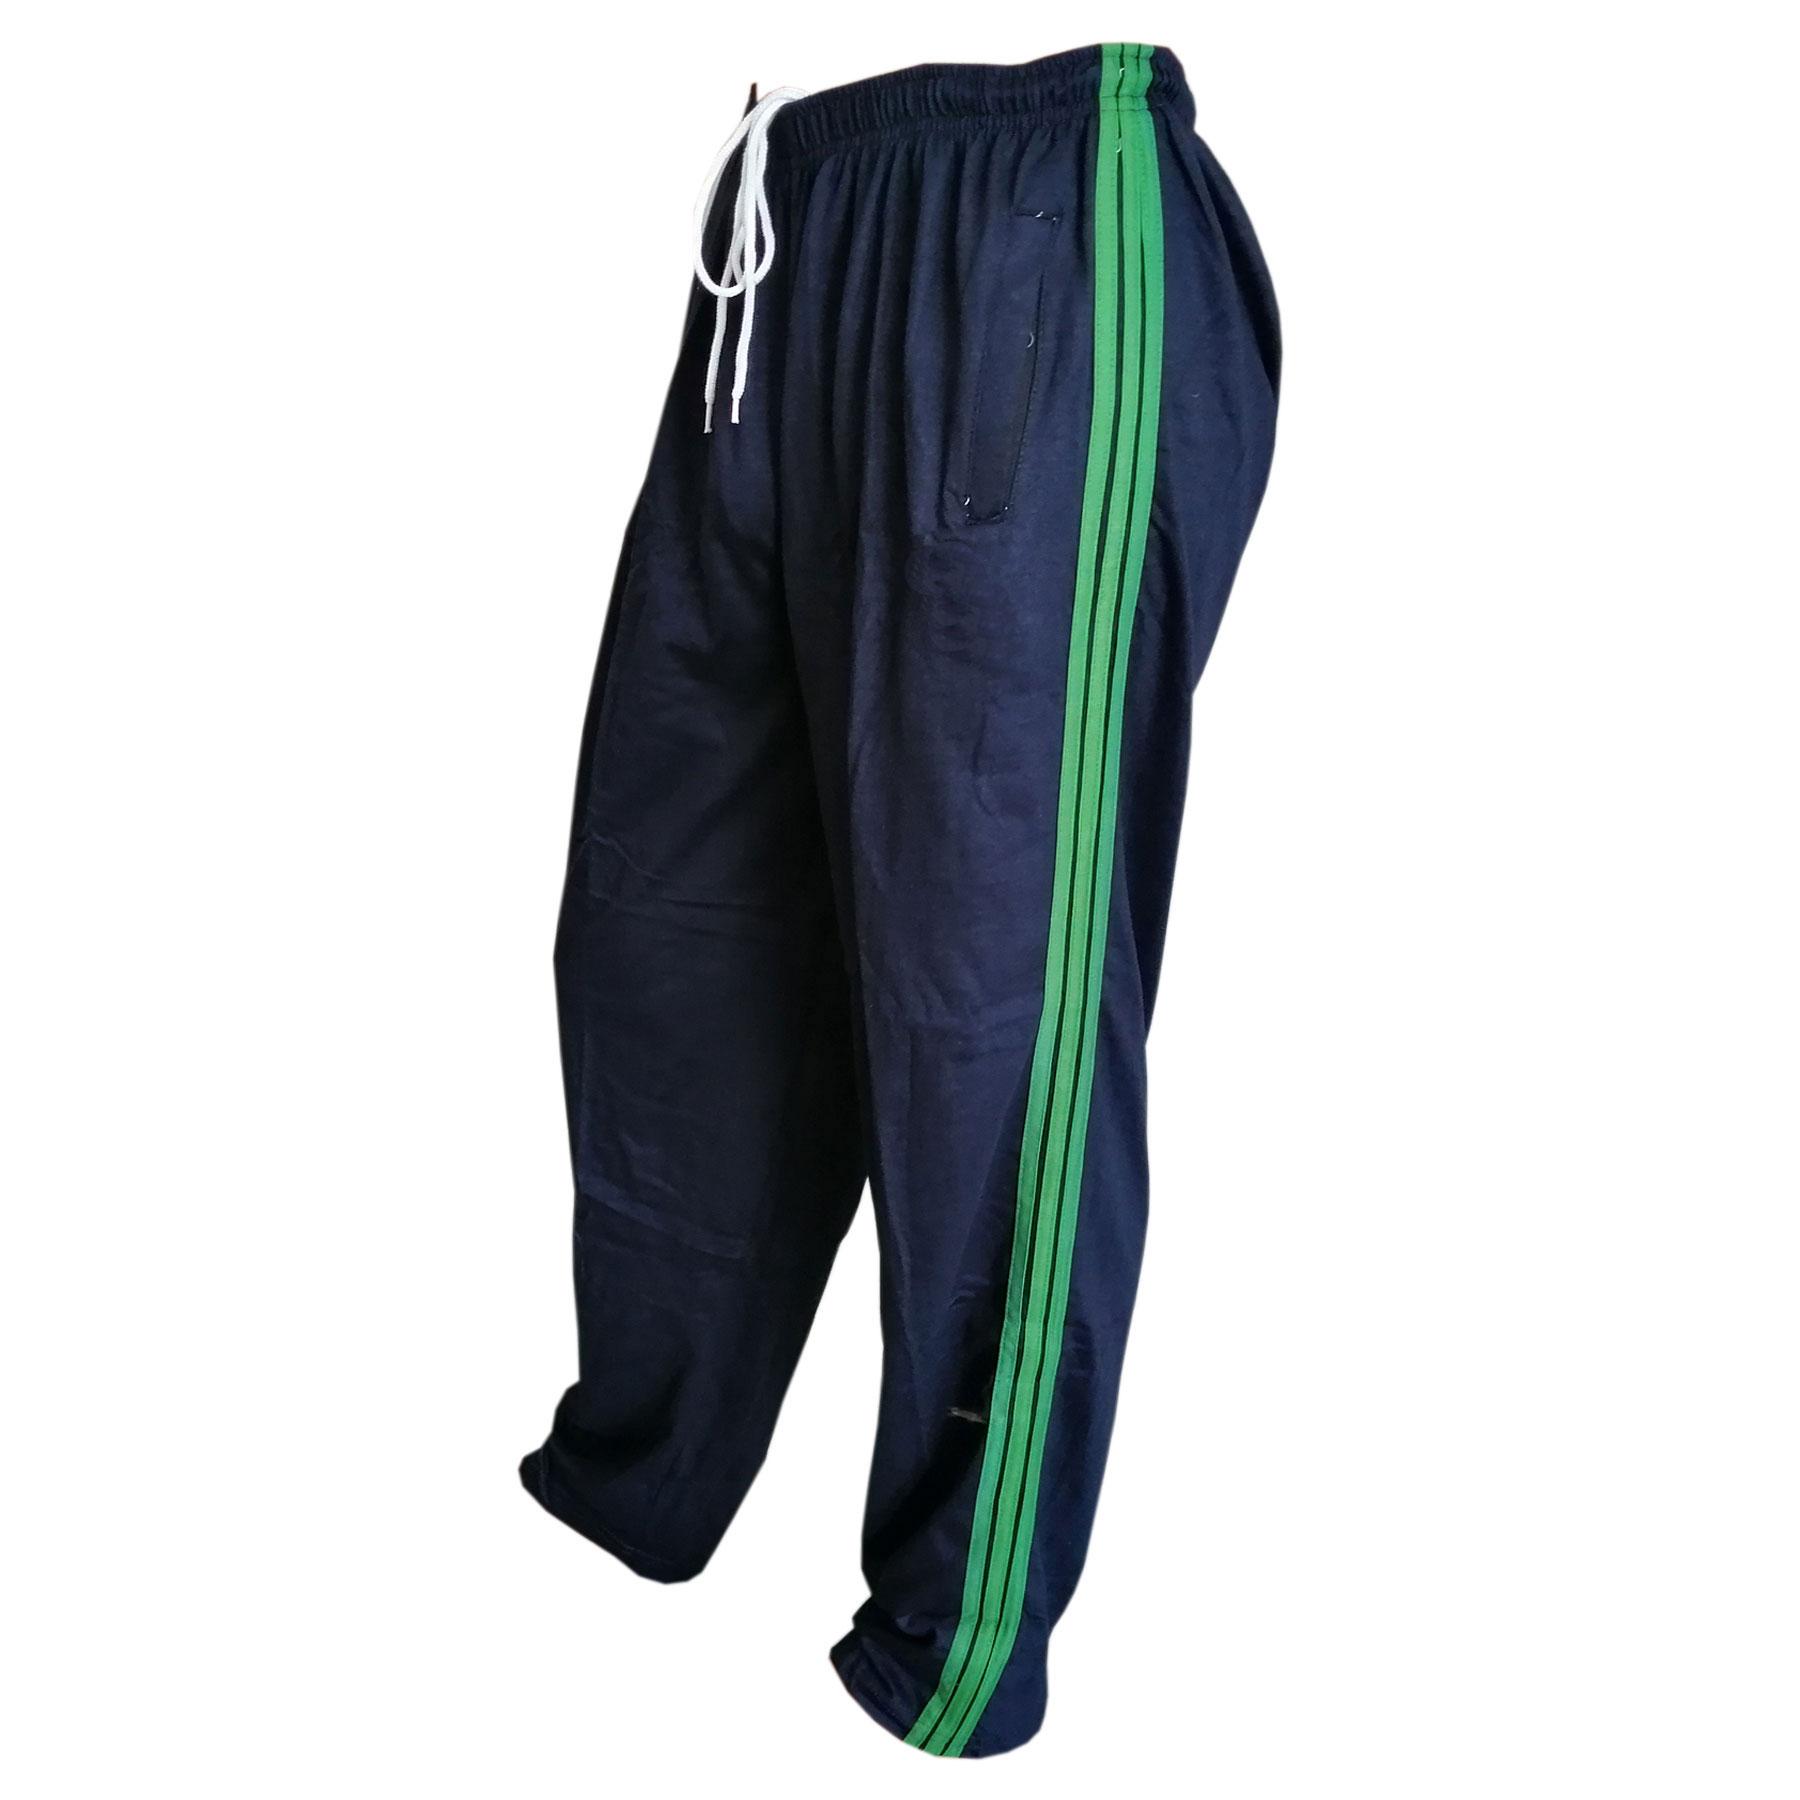 Multi Stripped Men Jersey Trouser for Regular and Sleeping Pajamas